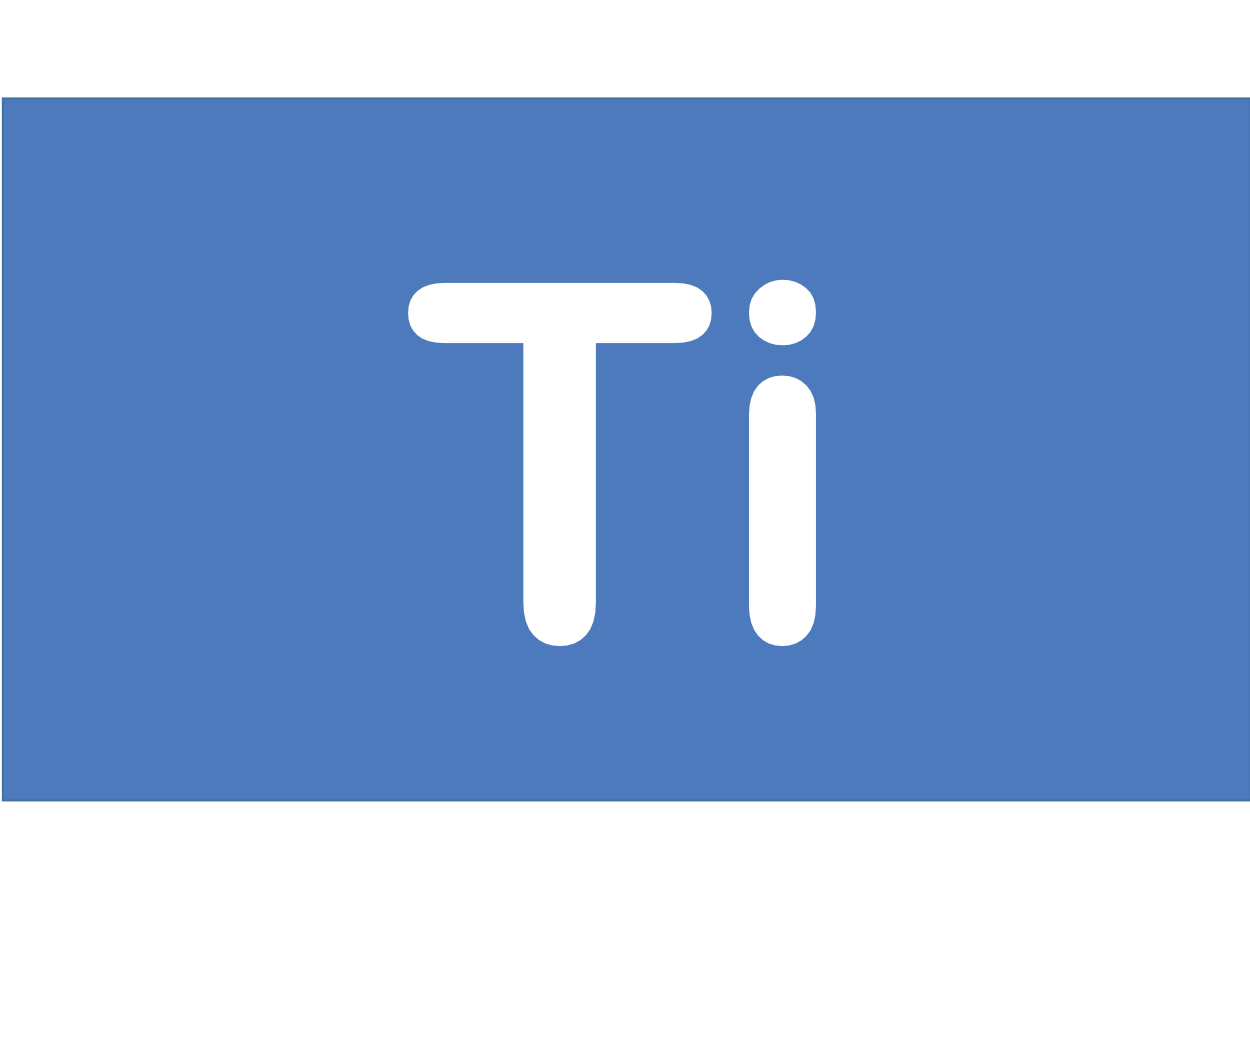 22 Ti チタン Titanium 元素 記号 周期表 化学 原子